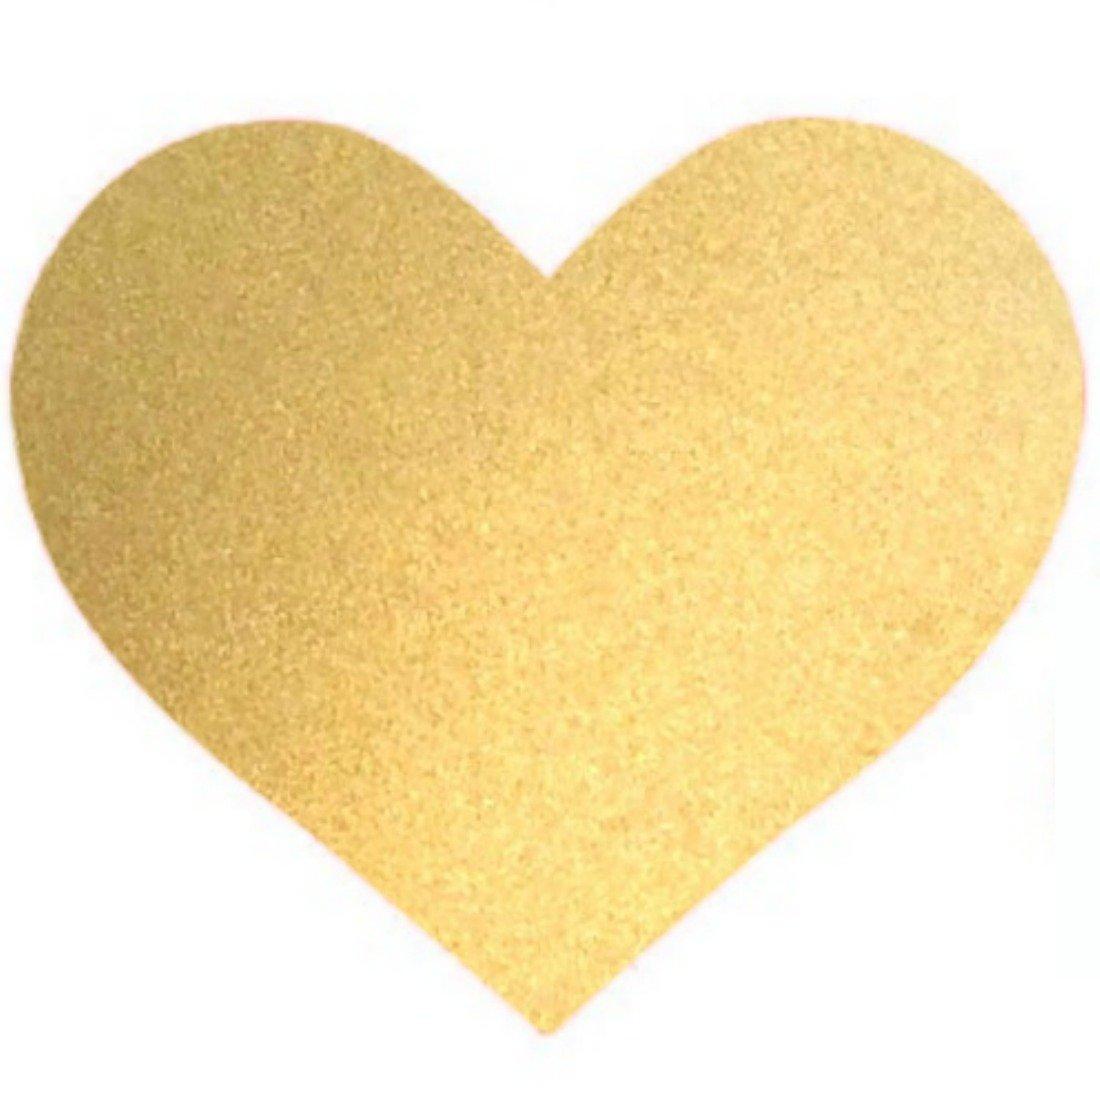 Amazon.com: Bobee Gold Heart Dots Vinyl Wall Decals, 36-Count: Home ...